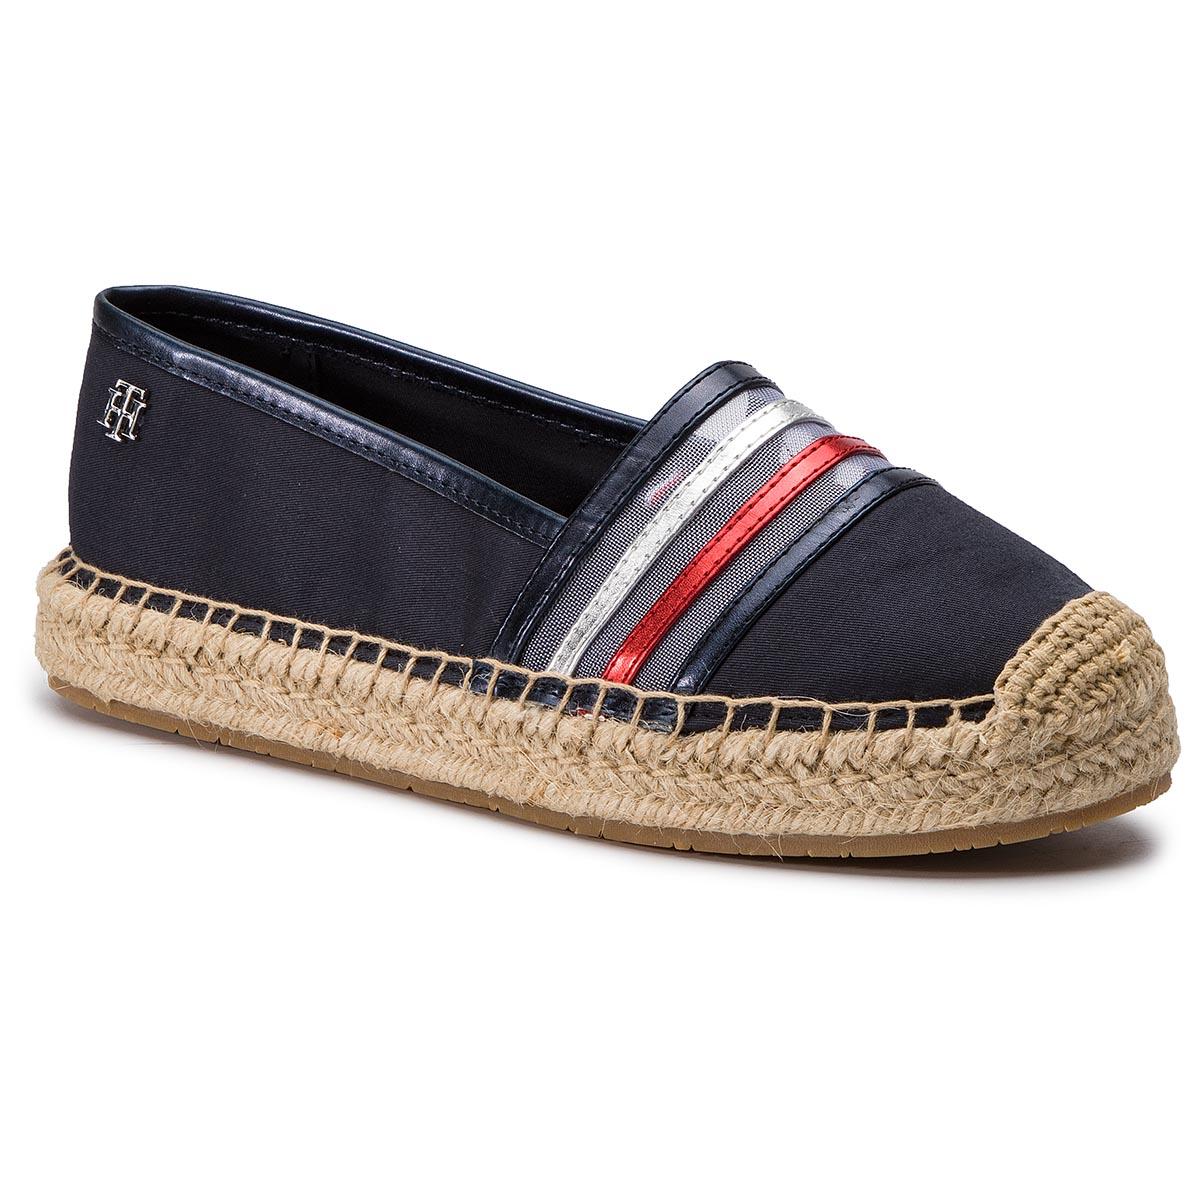 7 Pnkwht Ziane Sneakers Grand 2 119 Lacoste 37cfa0054208 Plus Cfa O0kn8wP